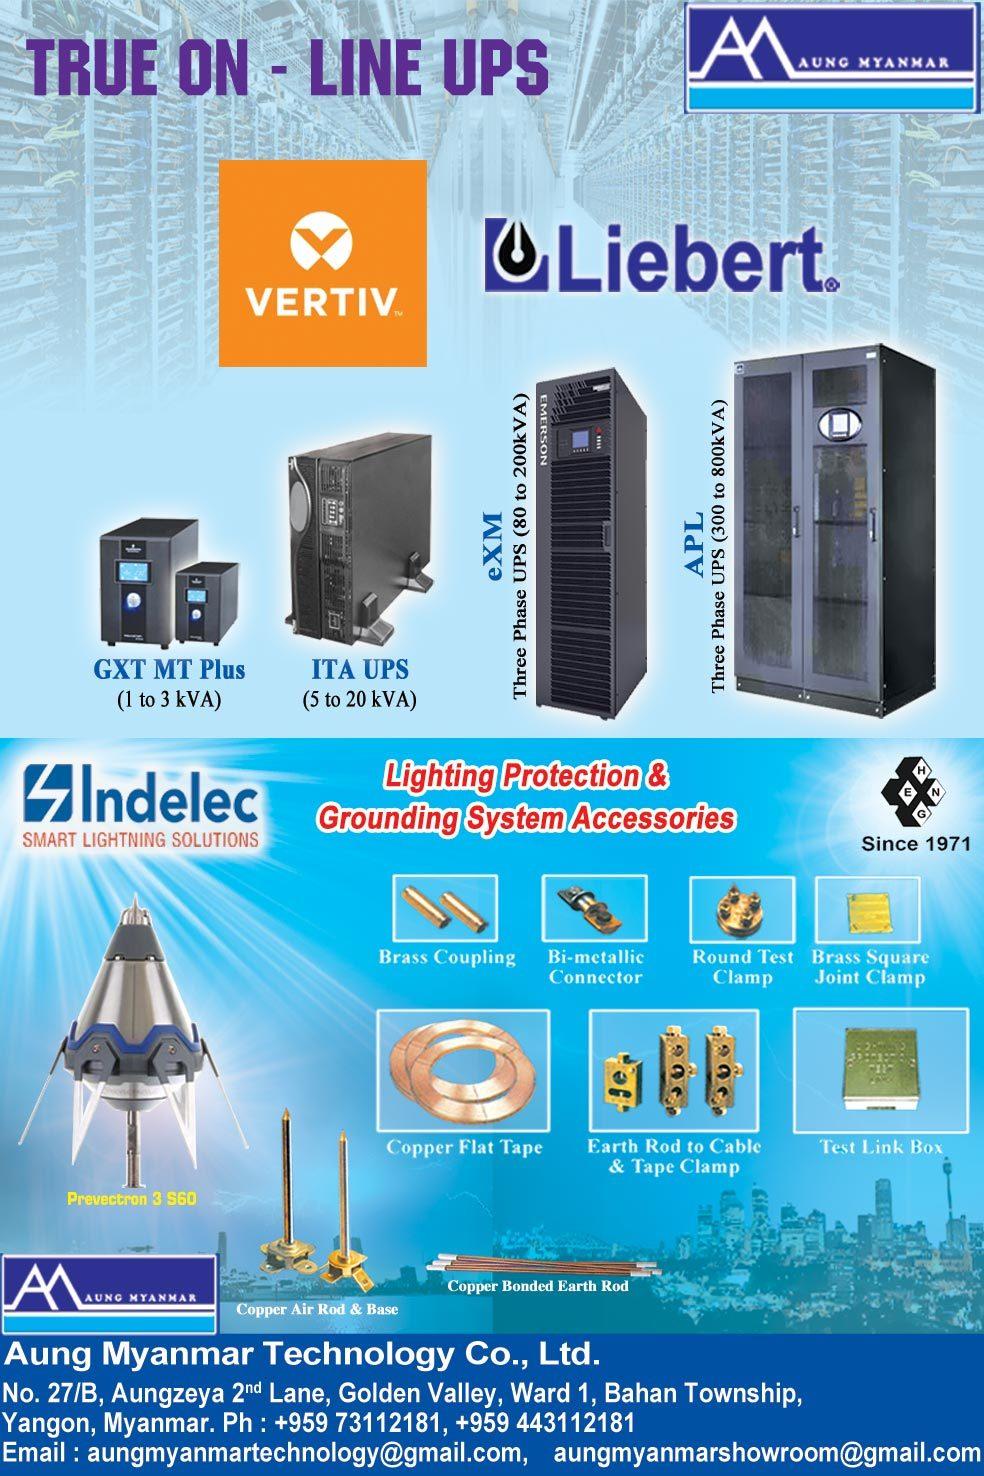 Aung-Myanmar-Technology-Co-Ltd_Uninterruptible-Power-Supply-(UPS)_(B)_4707.jpg